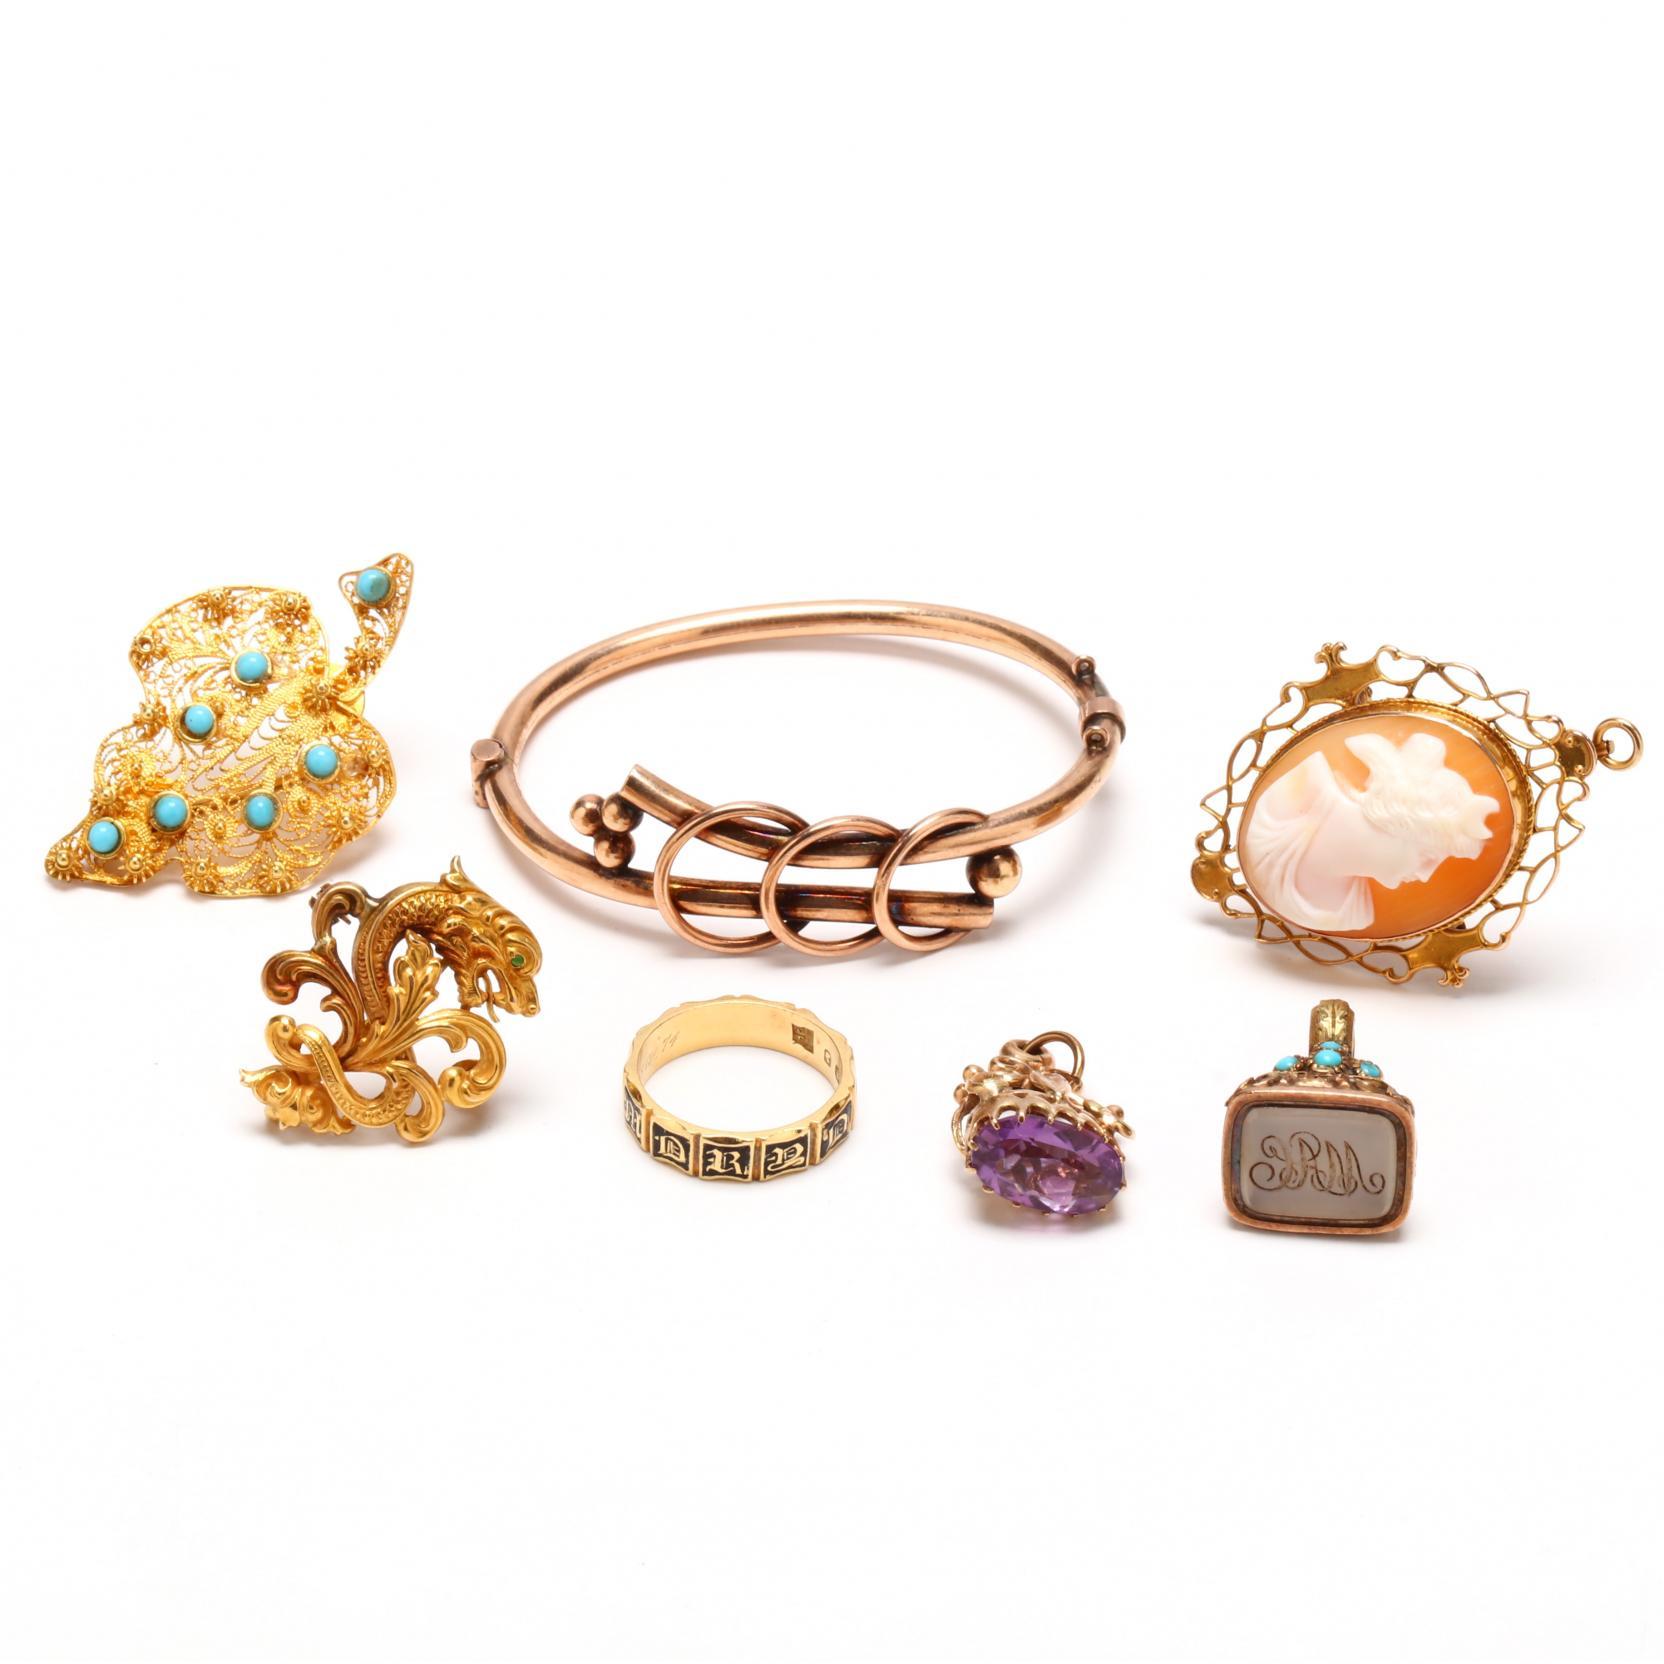 seven-antique-jewelry-items